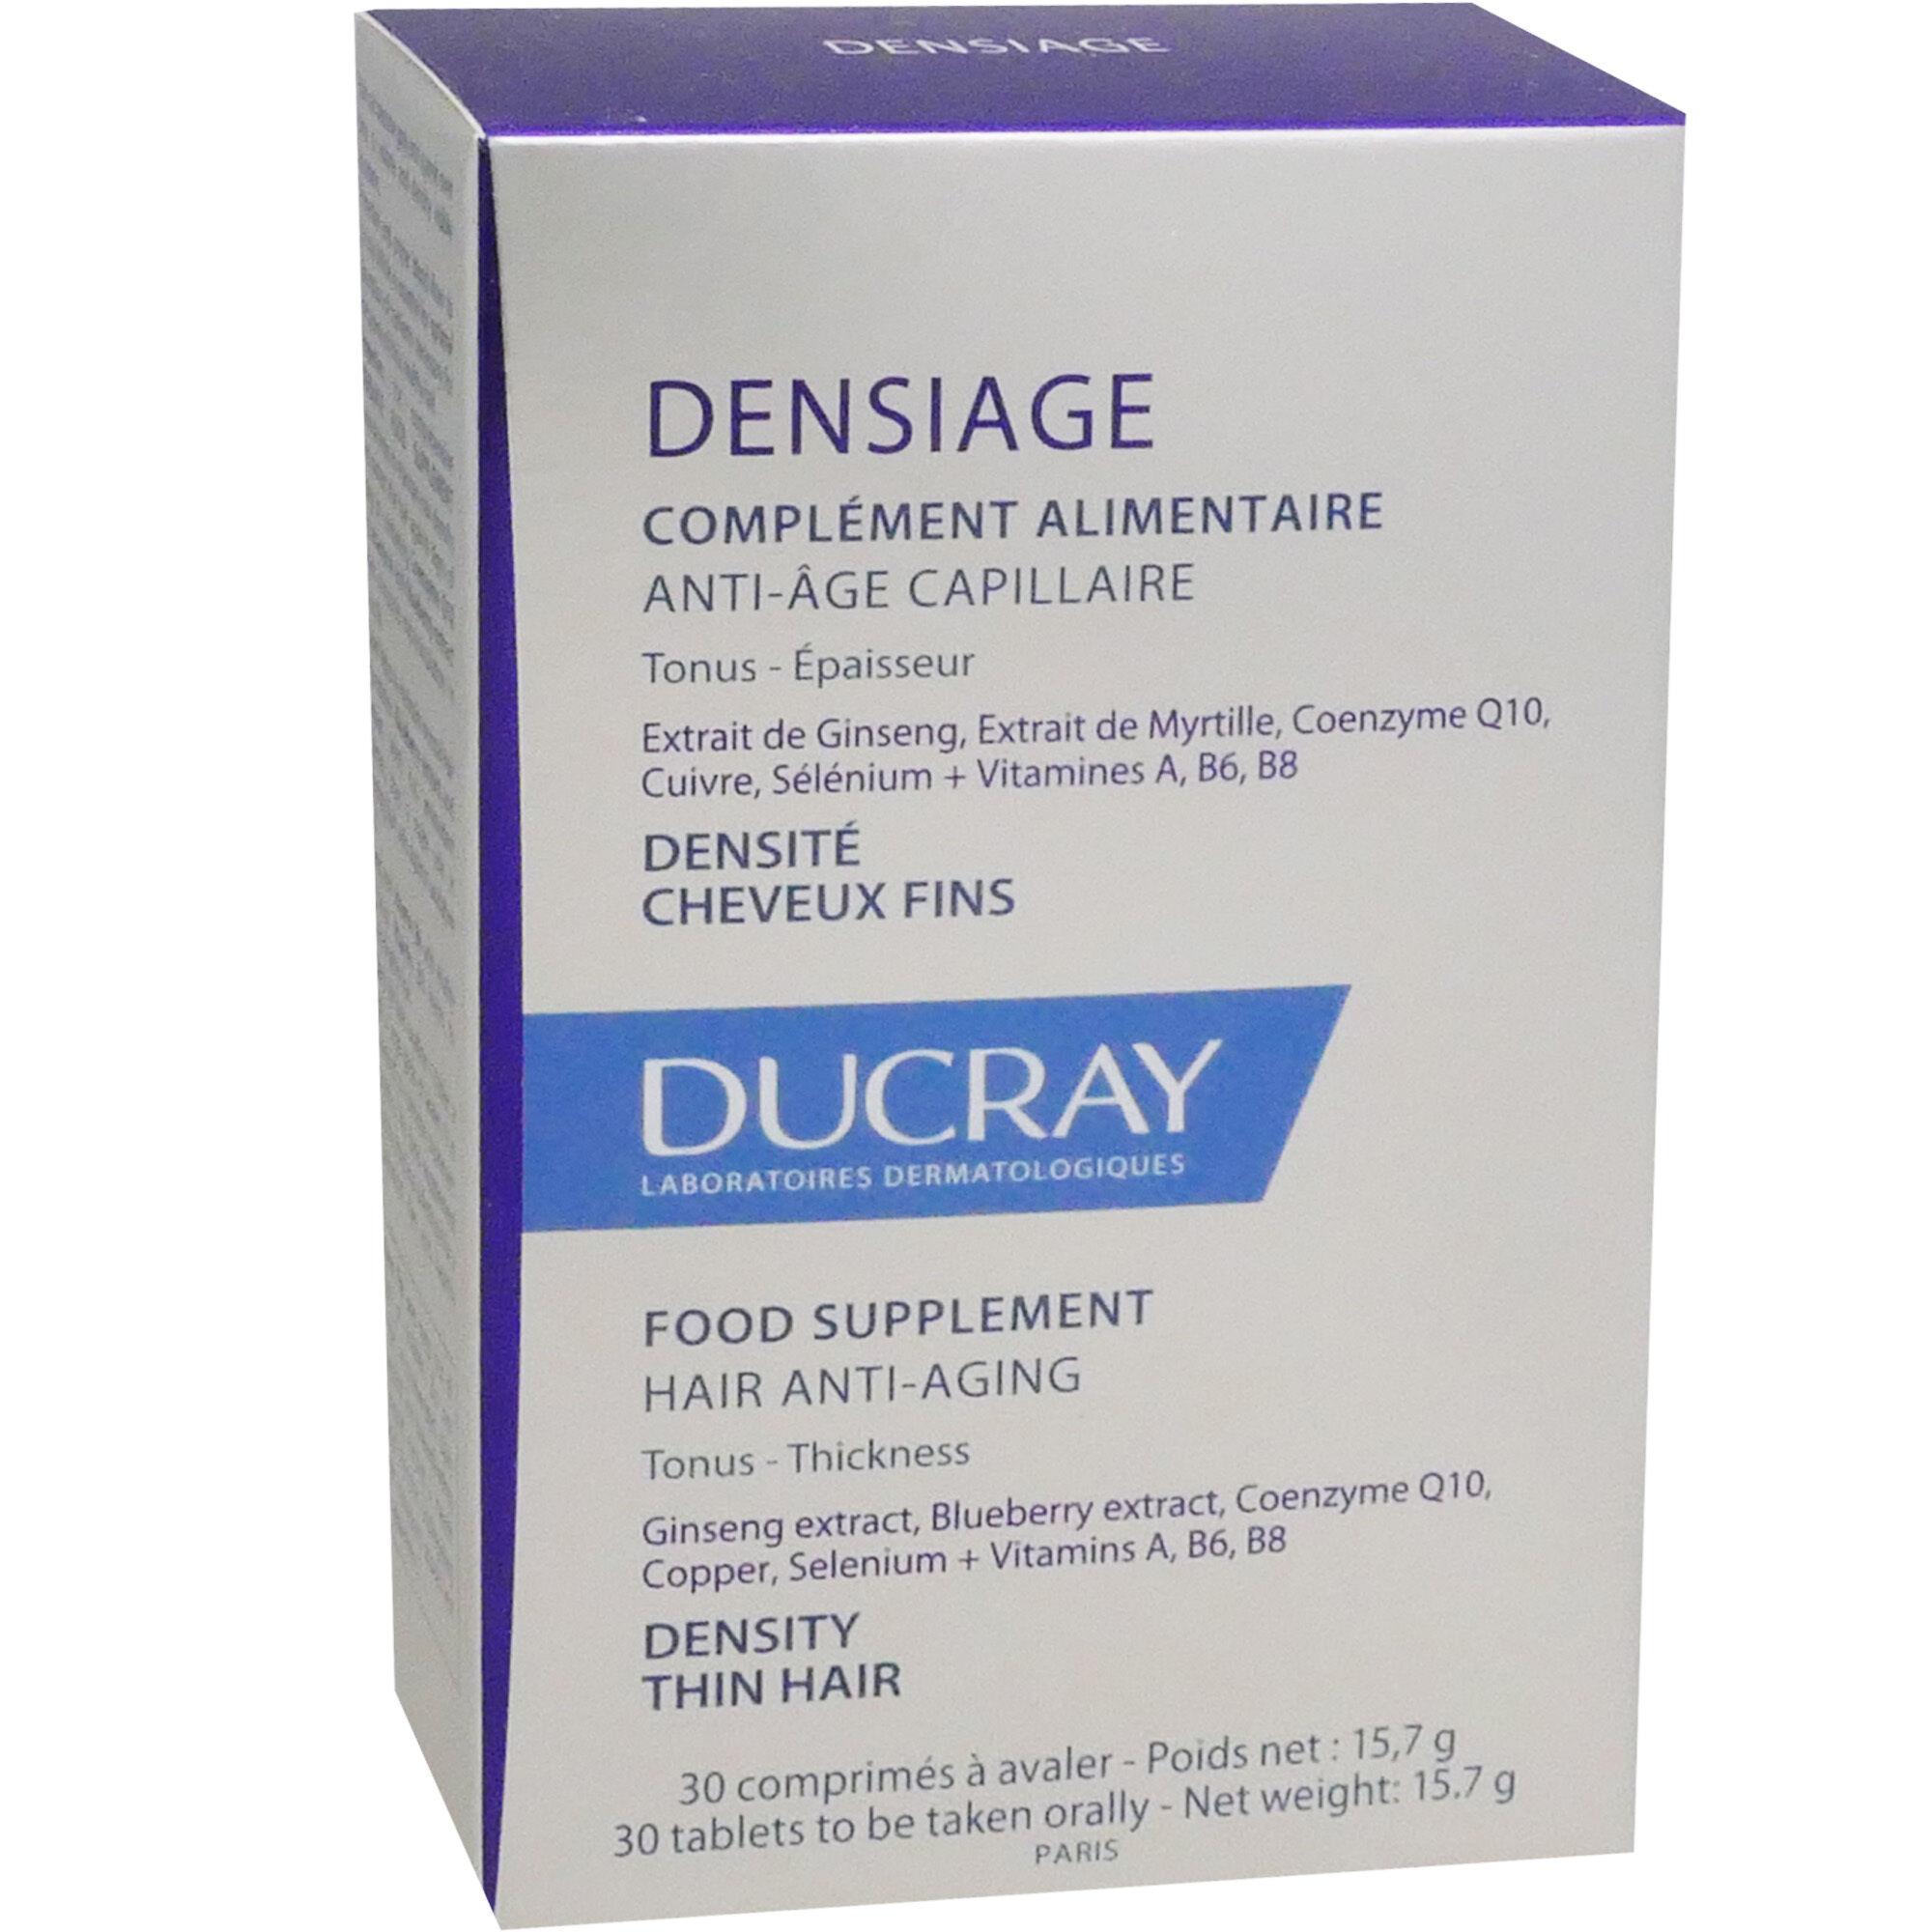 Ducray denisage anti-age  capillaire 30 comprimes